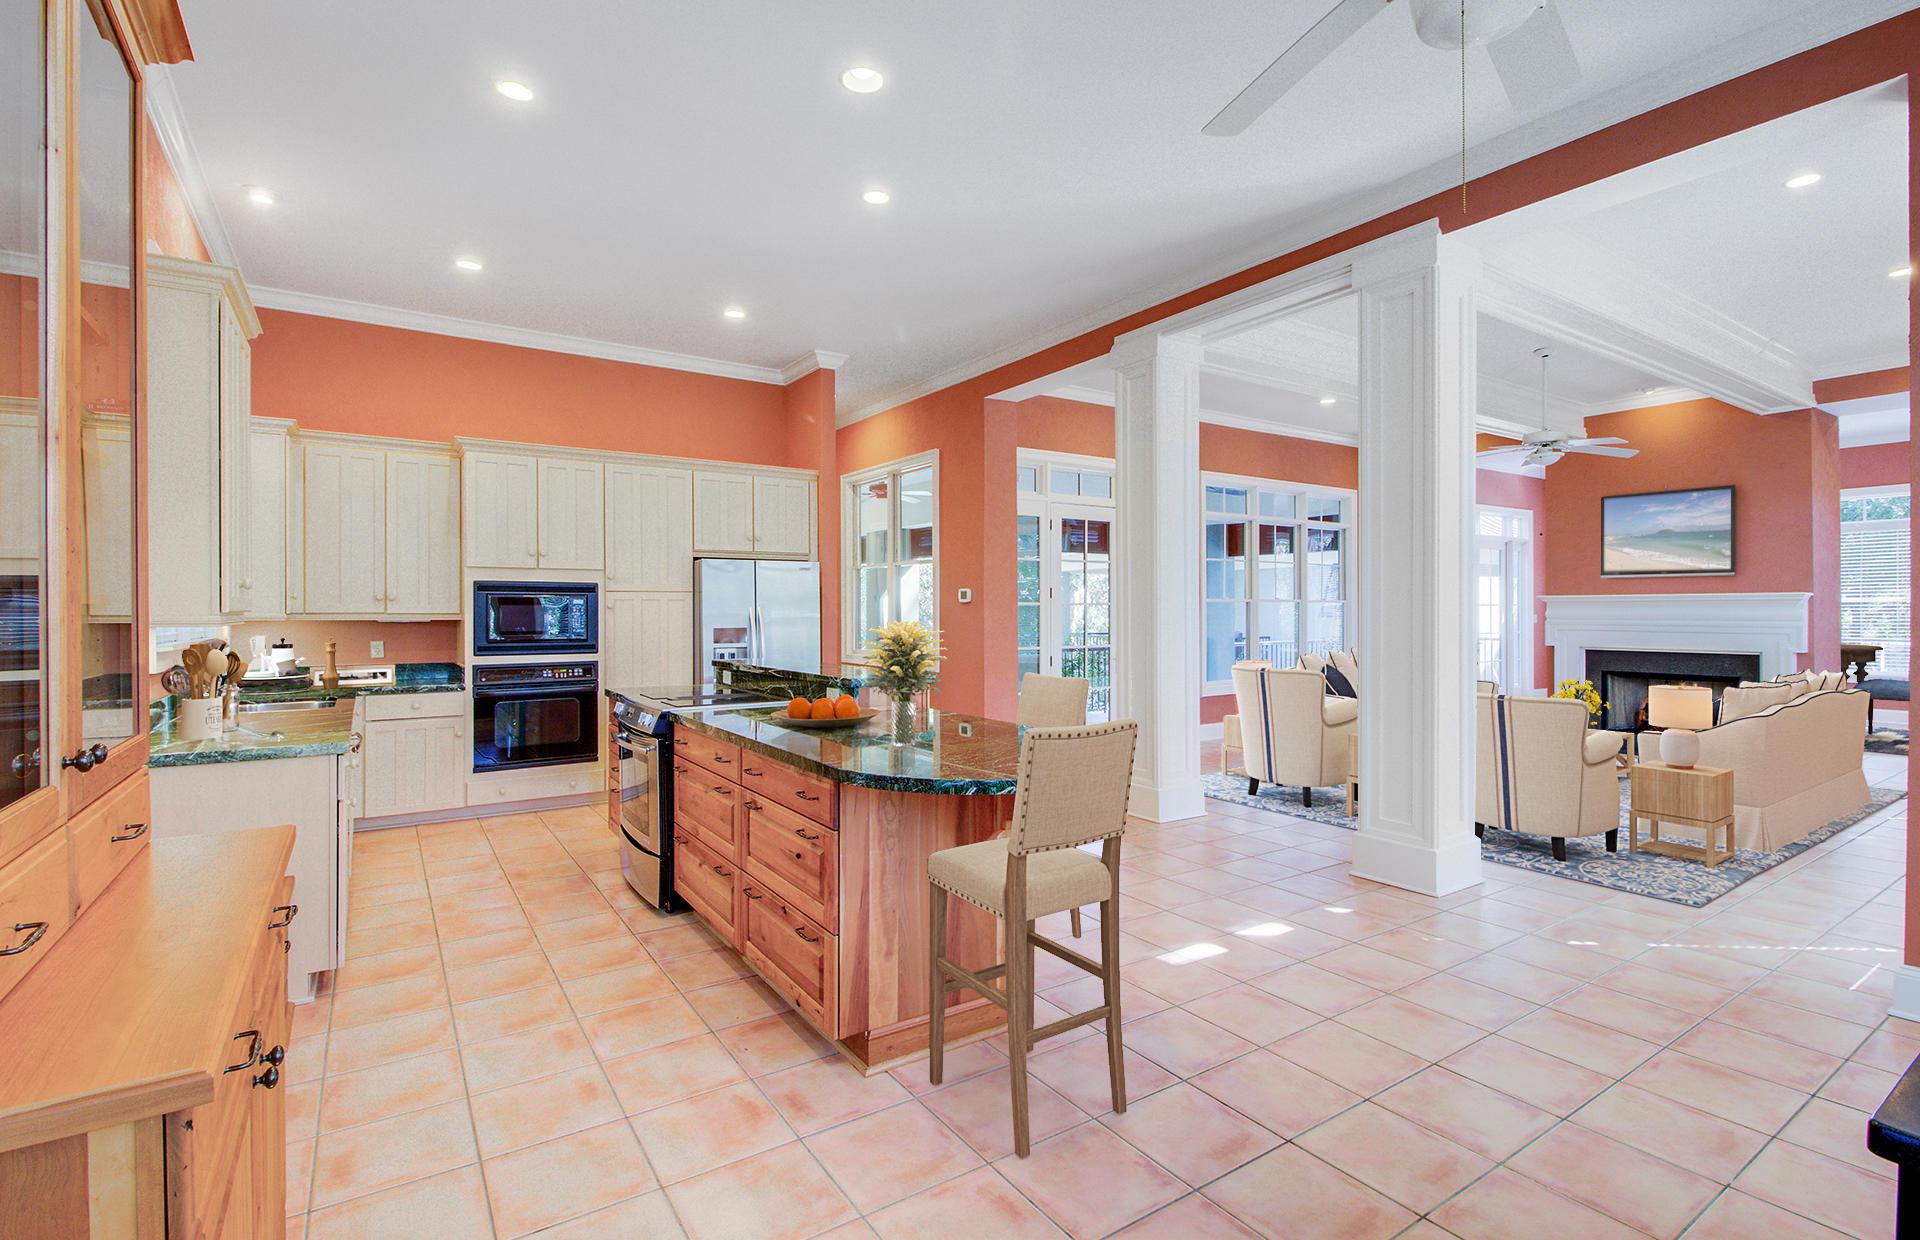 Kiawah Island Homes For Sale - 402 Ocean Oaks, Kiawah Island, SC - 40